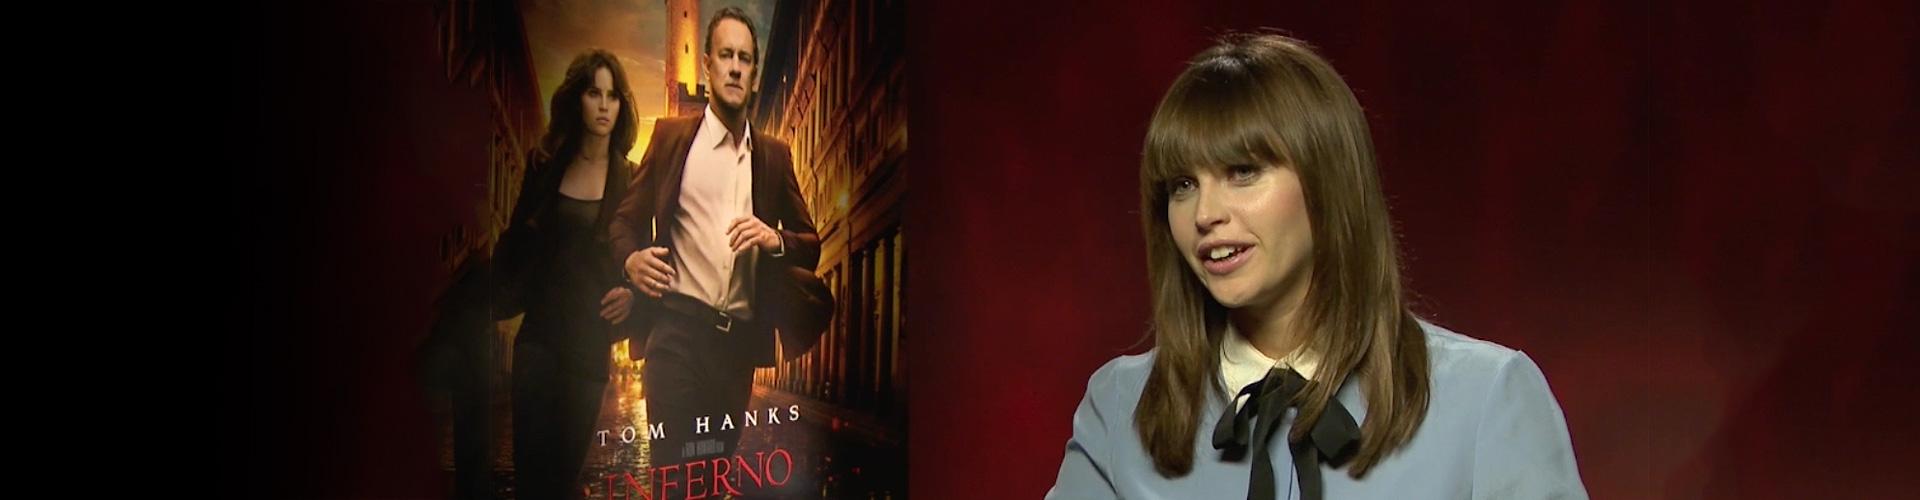 inferno-jones-interview-header.jpg